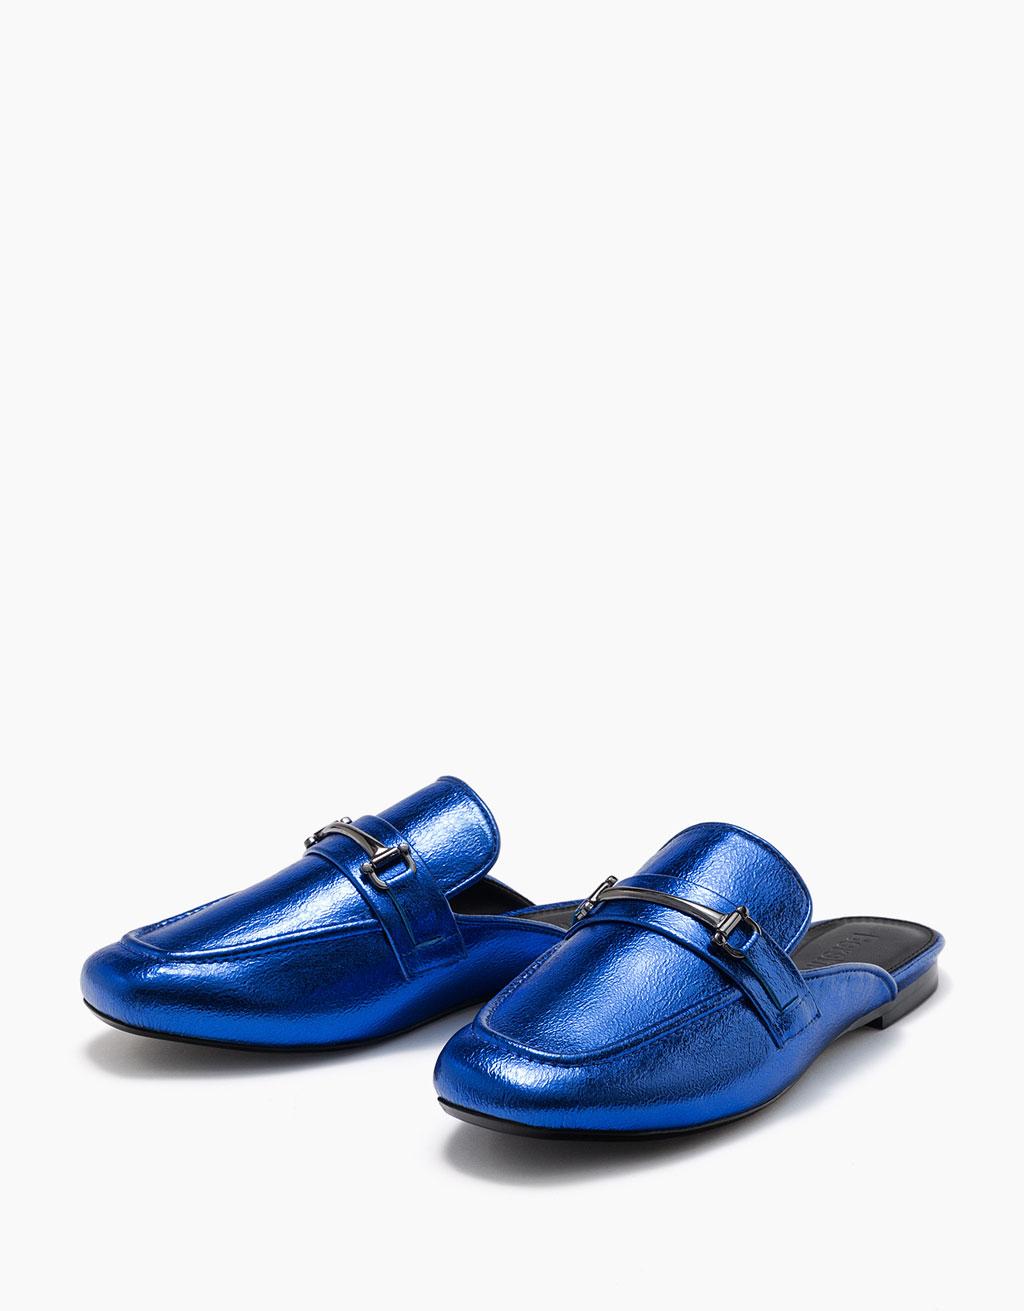 Metallic flat slingback shoes